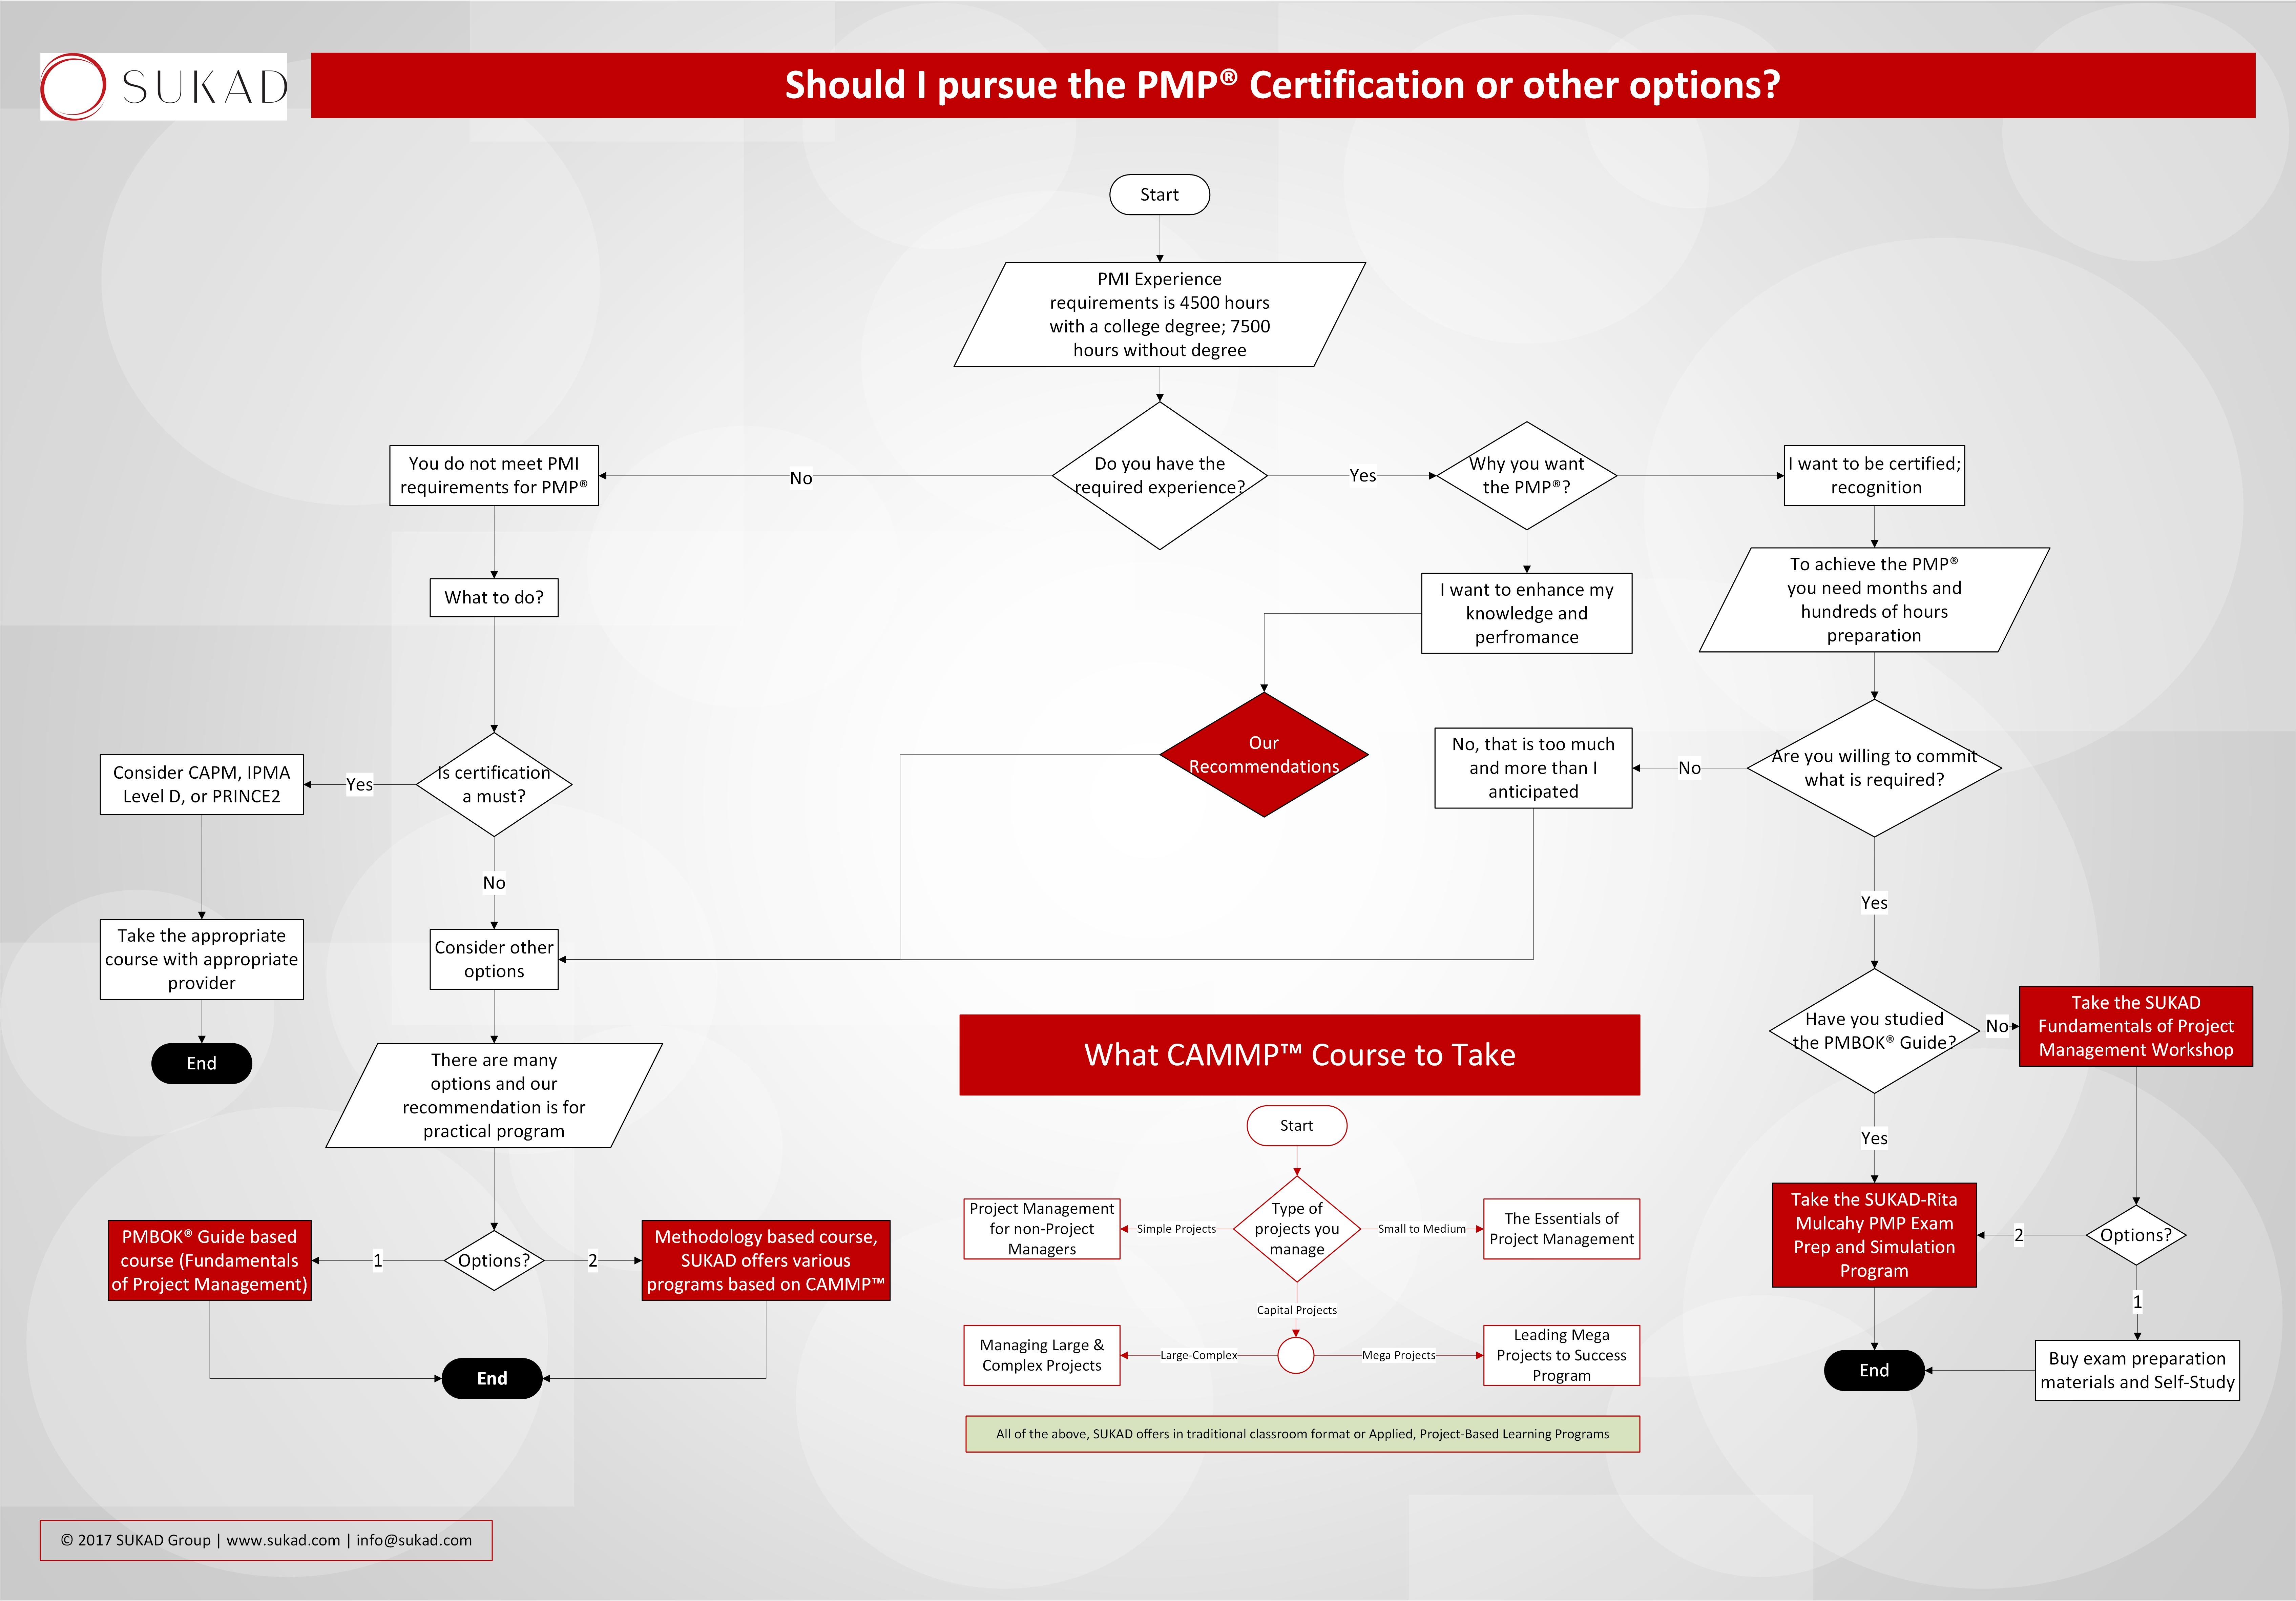 Should I Pursue A Pmp Certification Or Consider Alternatives